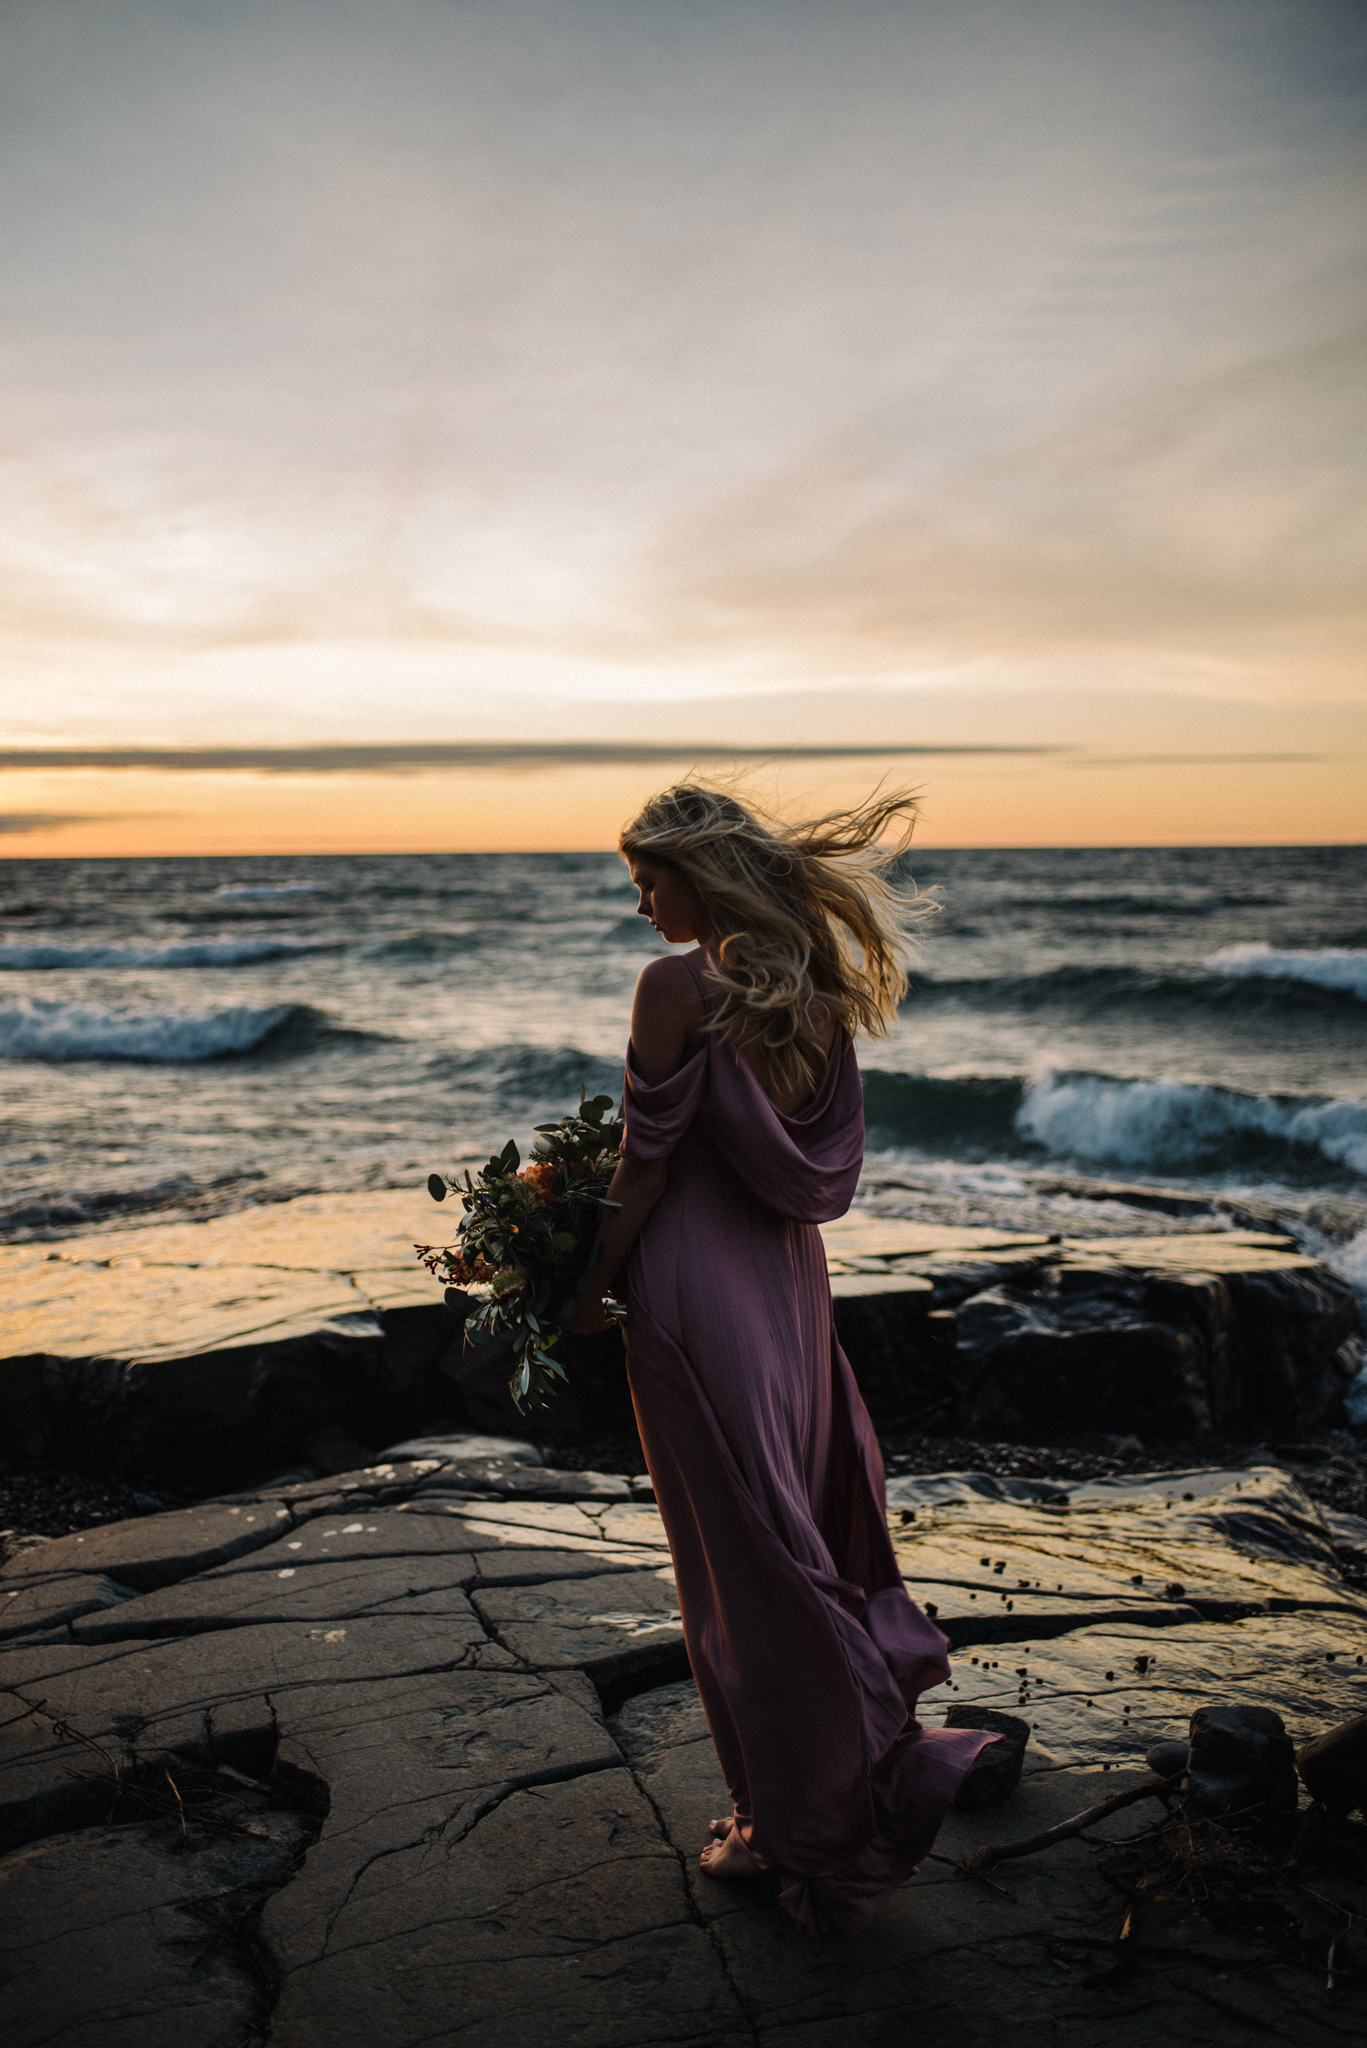 Madeira Creative - Clare Kolars - Emilee Bridal Portraits - White Sails Photography - North Shore - Lake Superior_7.JPG